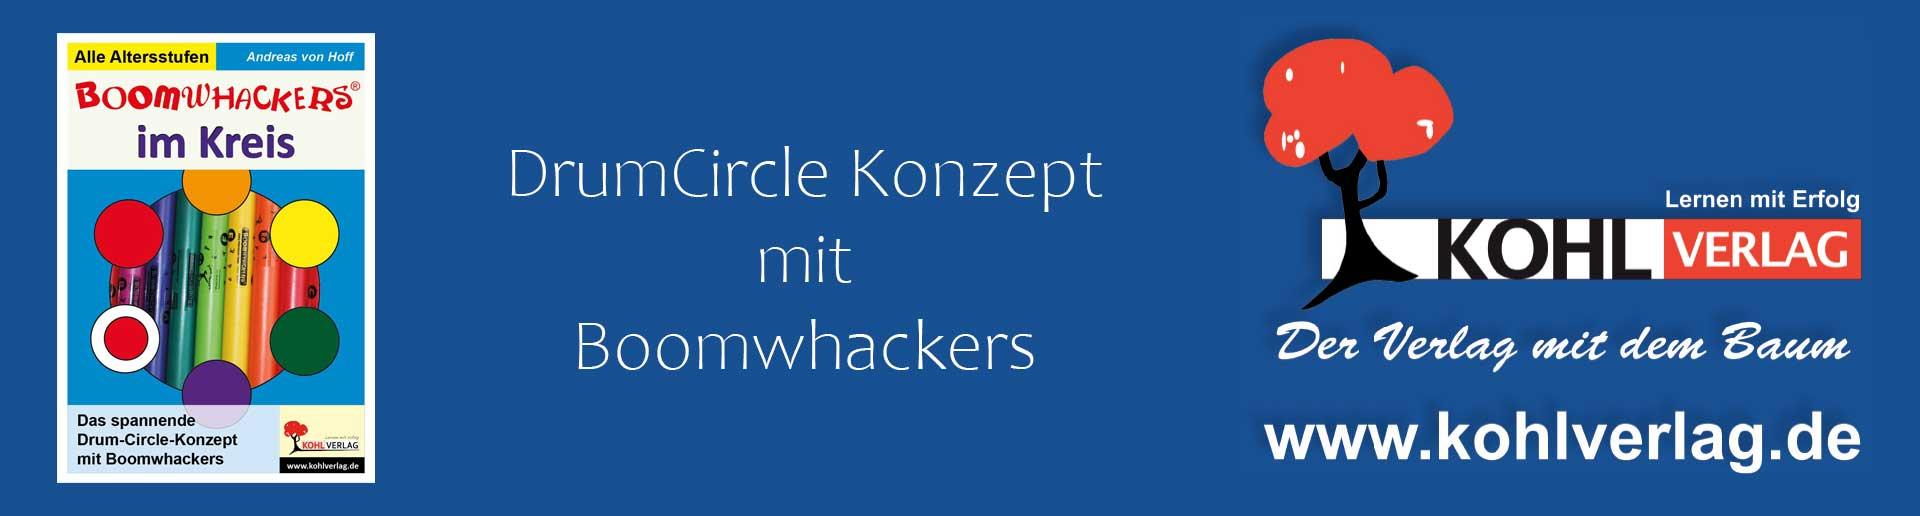 Boomwhackers im Kreis – DrumCircle Konzept mit Boomwhackers